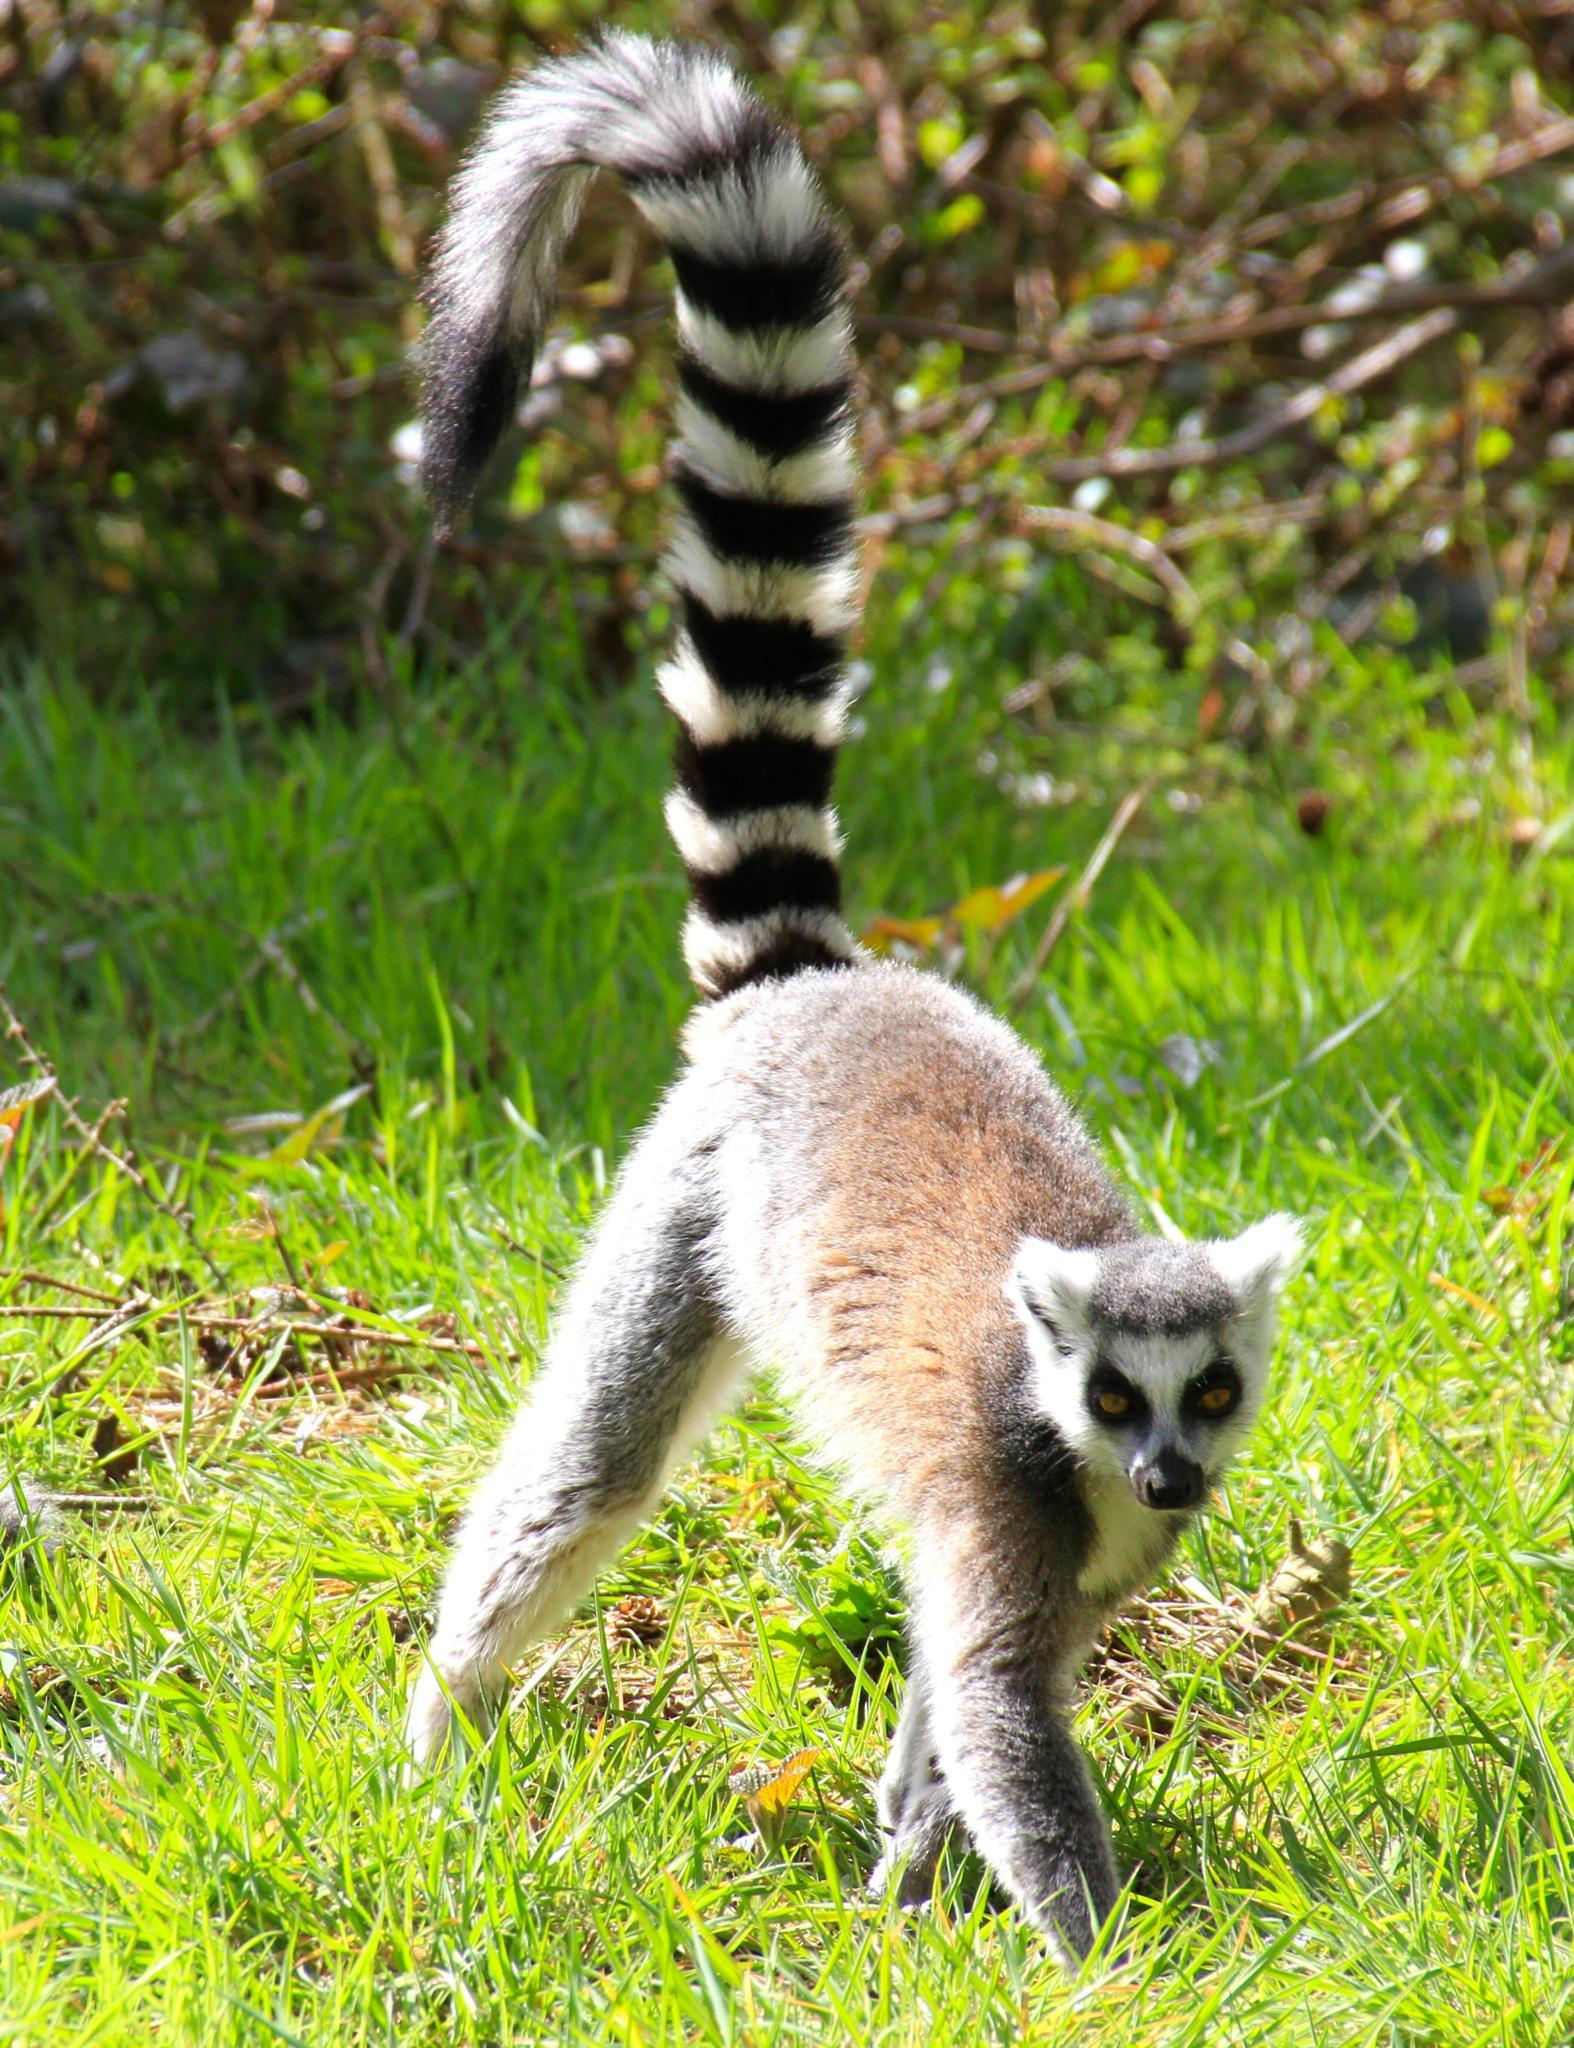 Lemur by Martin Roper